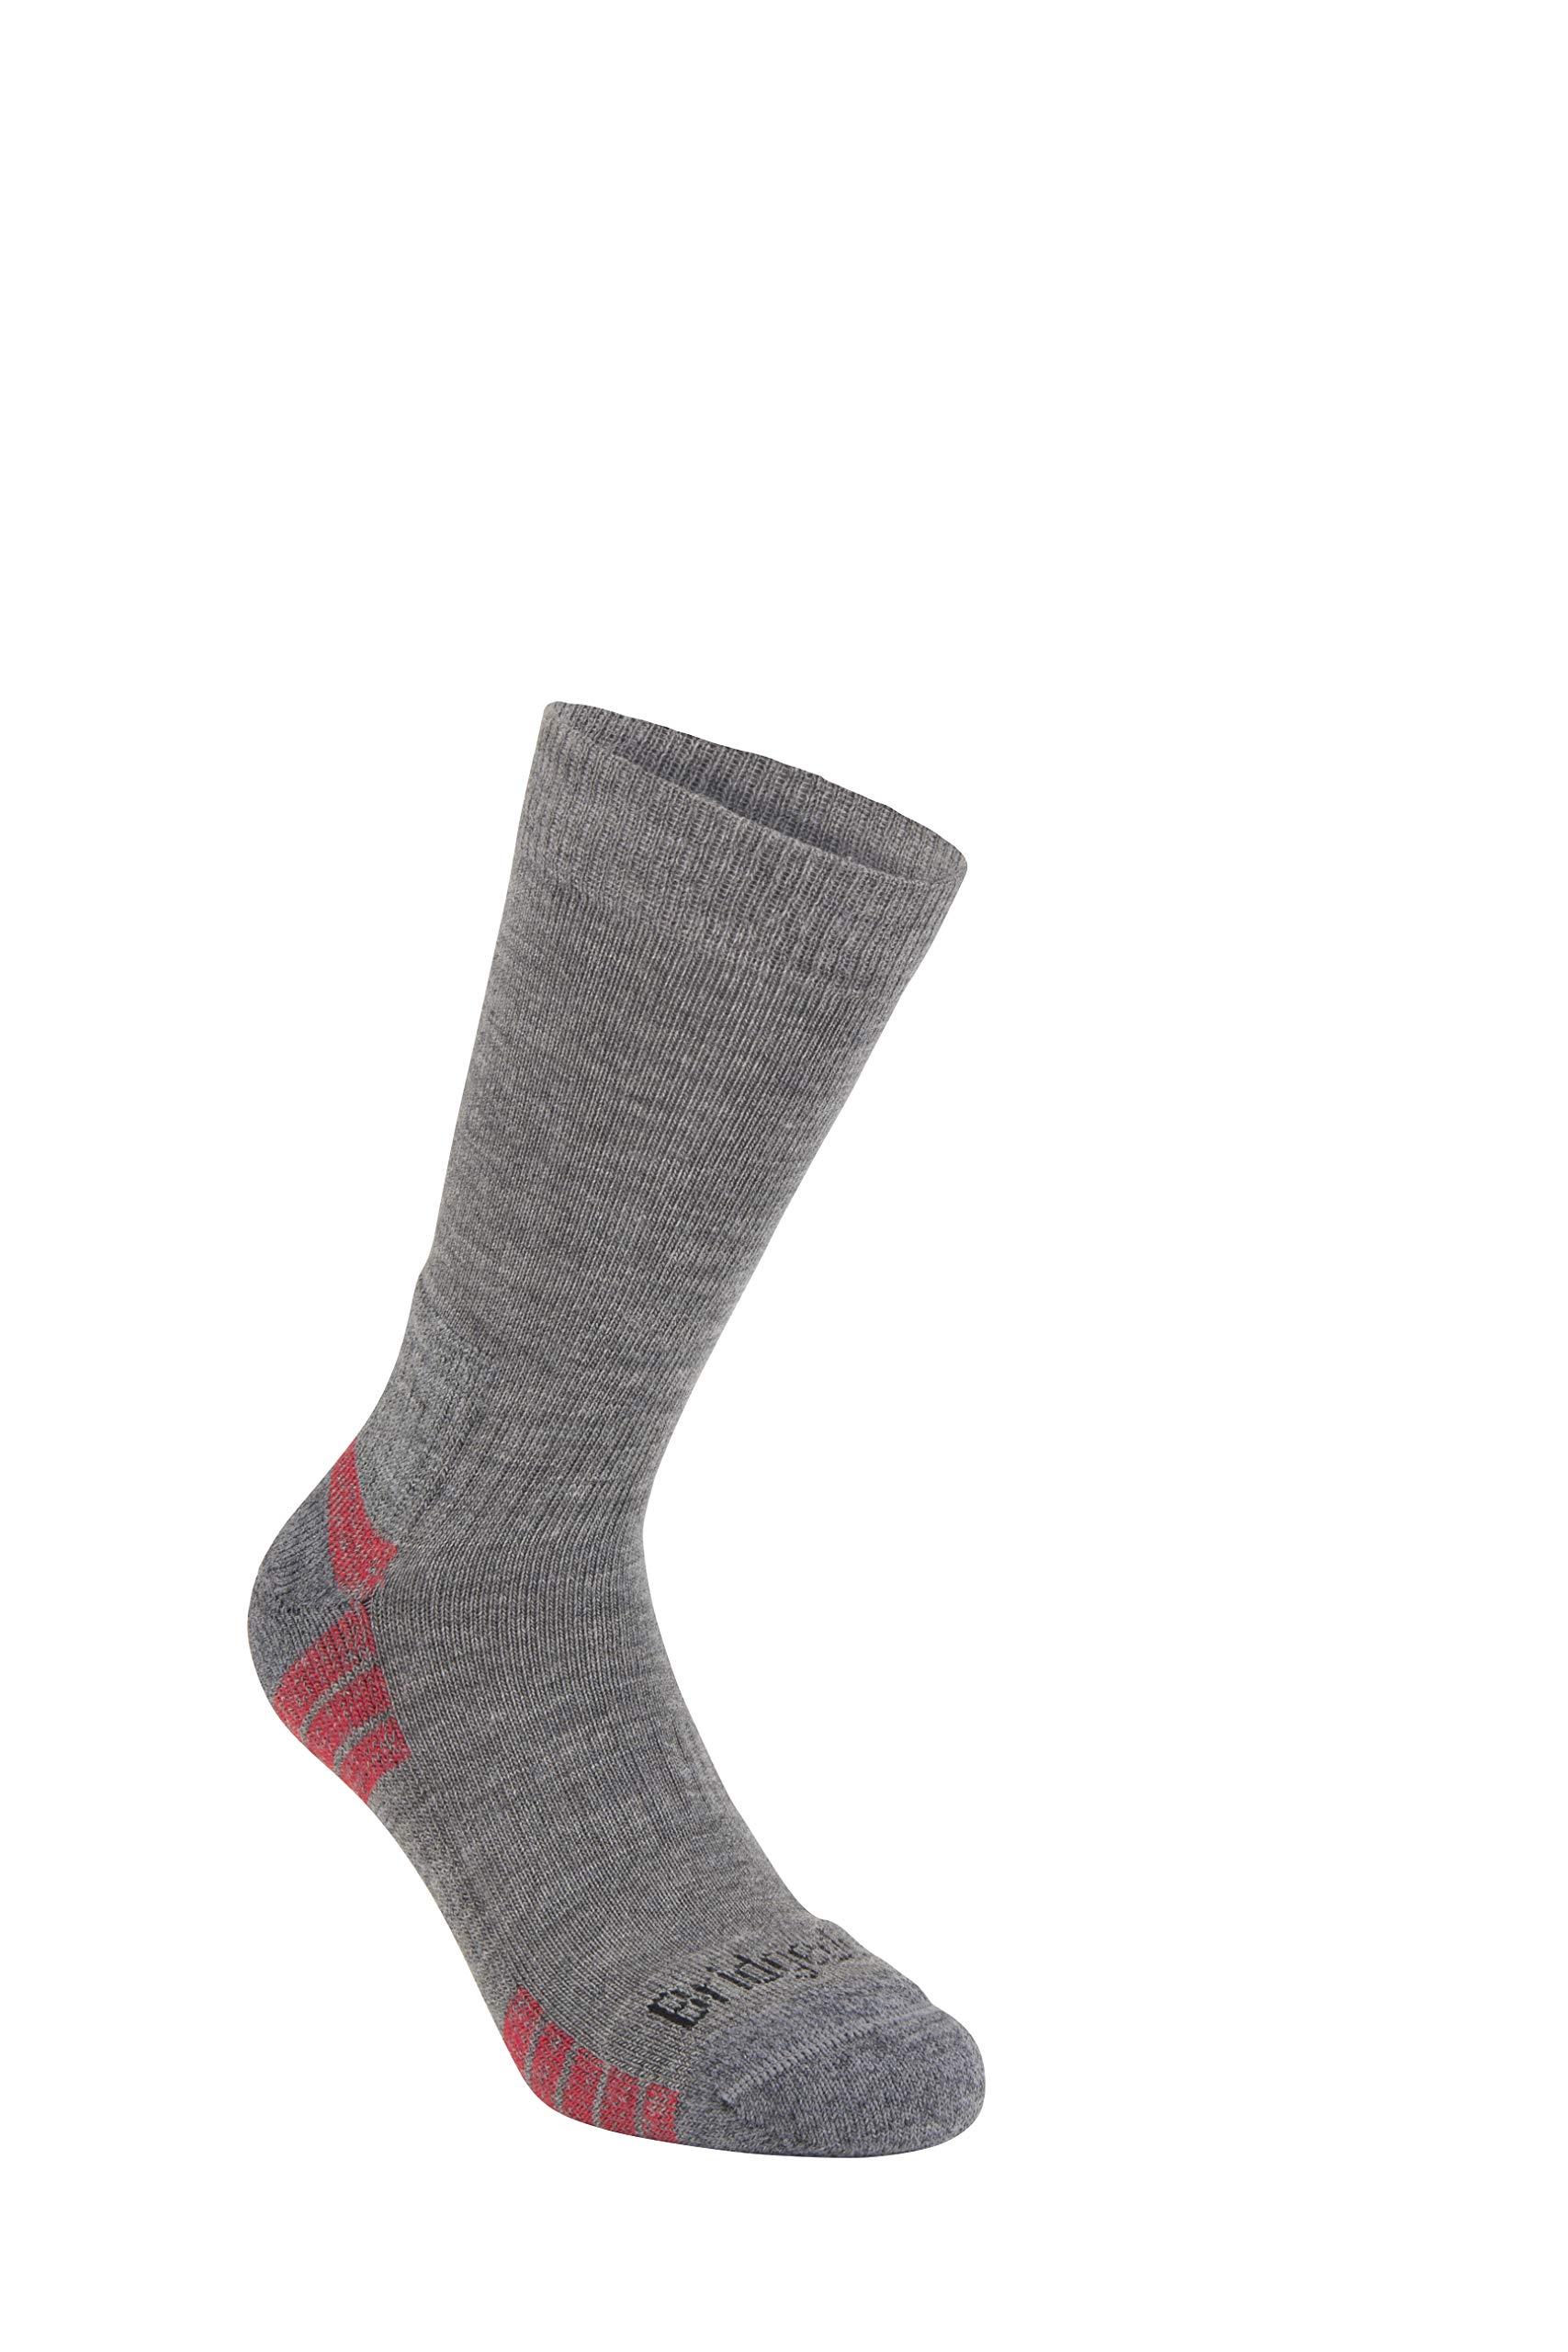 Bridgedale Lightweight Boot Height - Merino Endurance Socks Lightweight Boot Height - Merino Endurance Socks